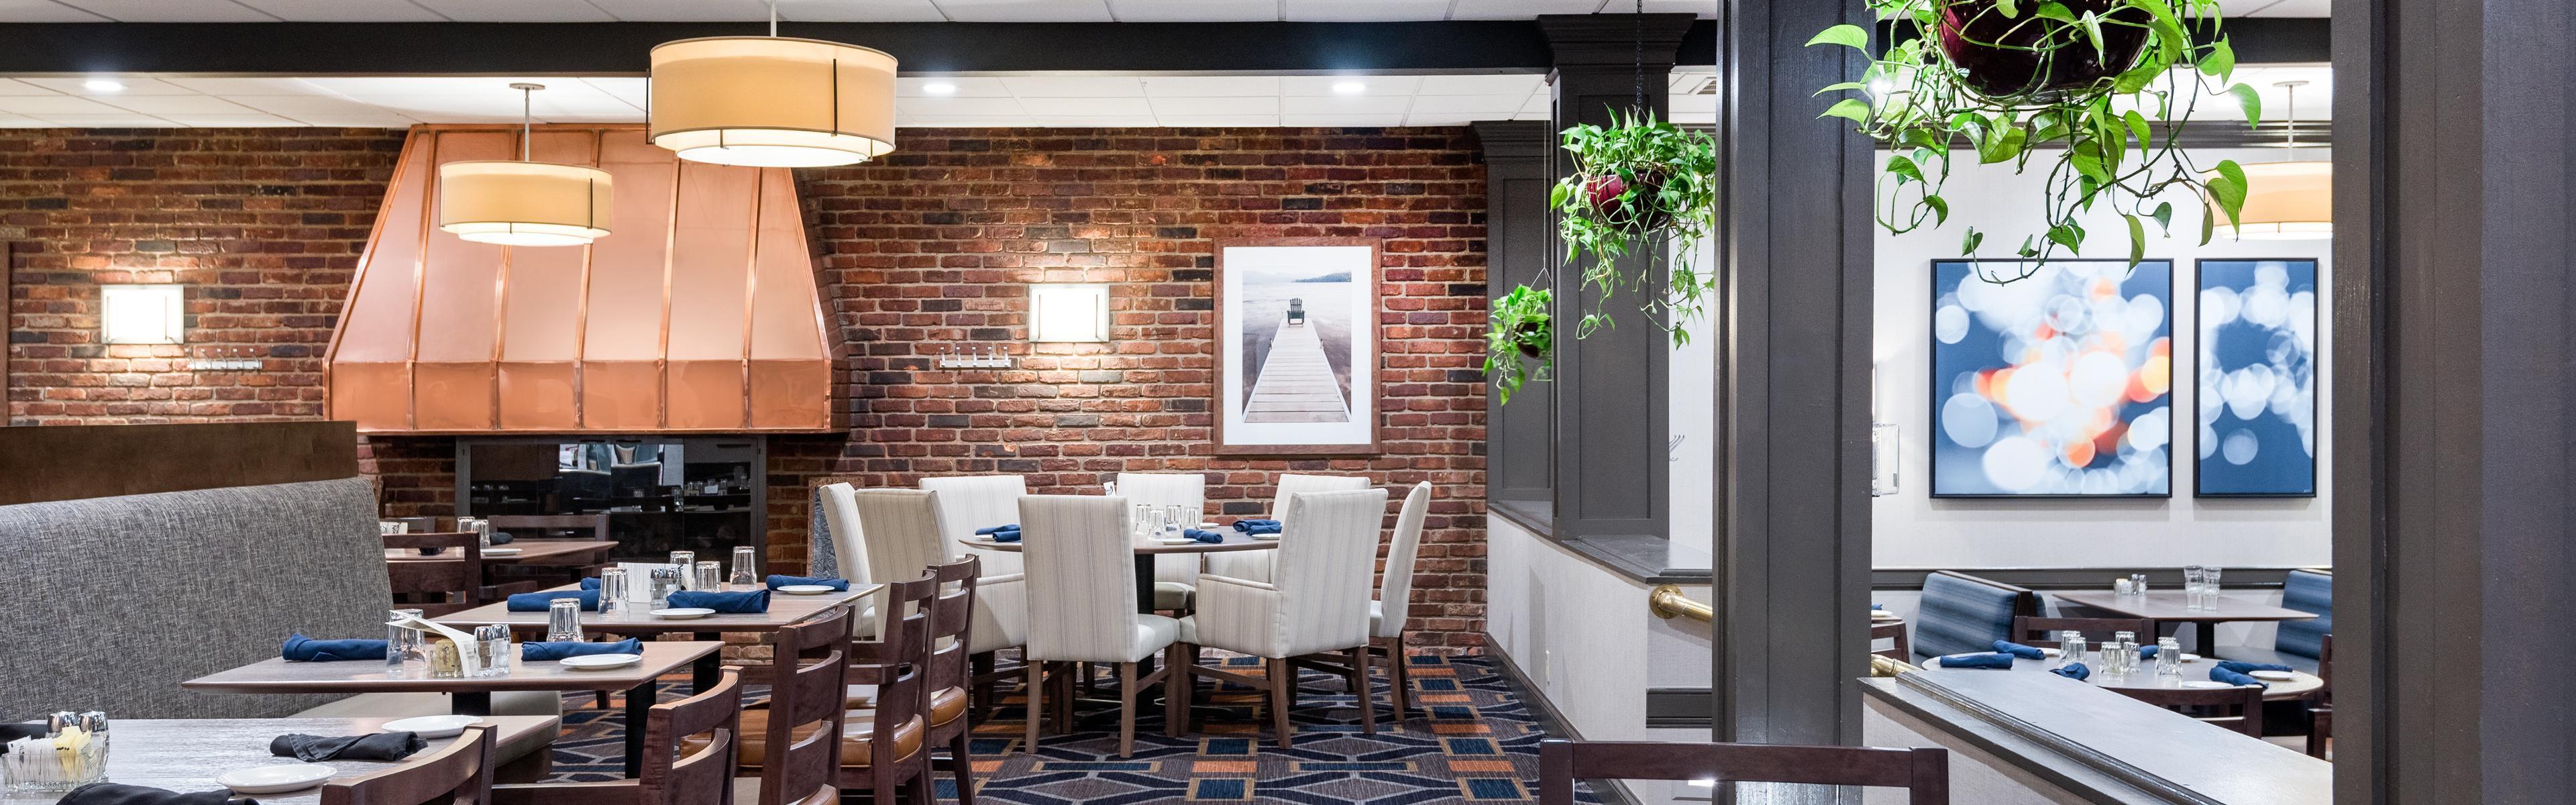 restaurants near holiday inn johnstown gloversville rh ihg com